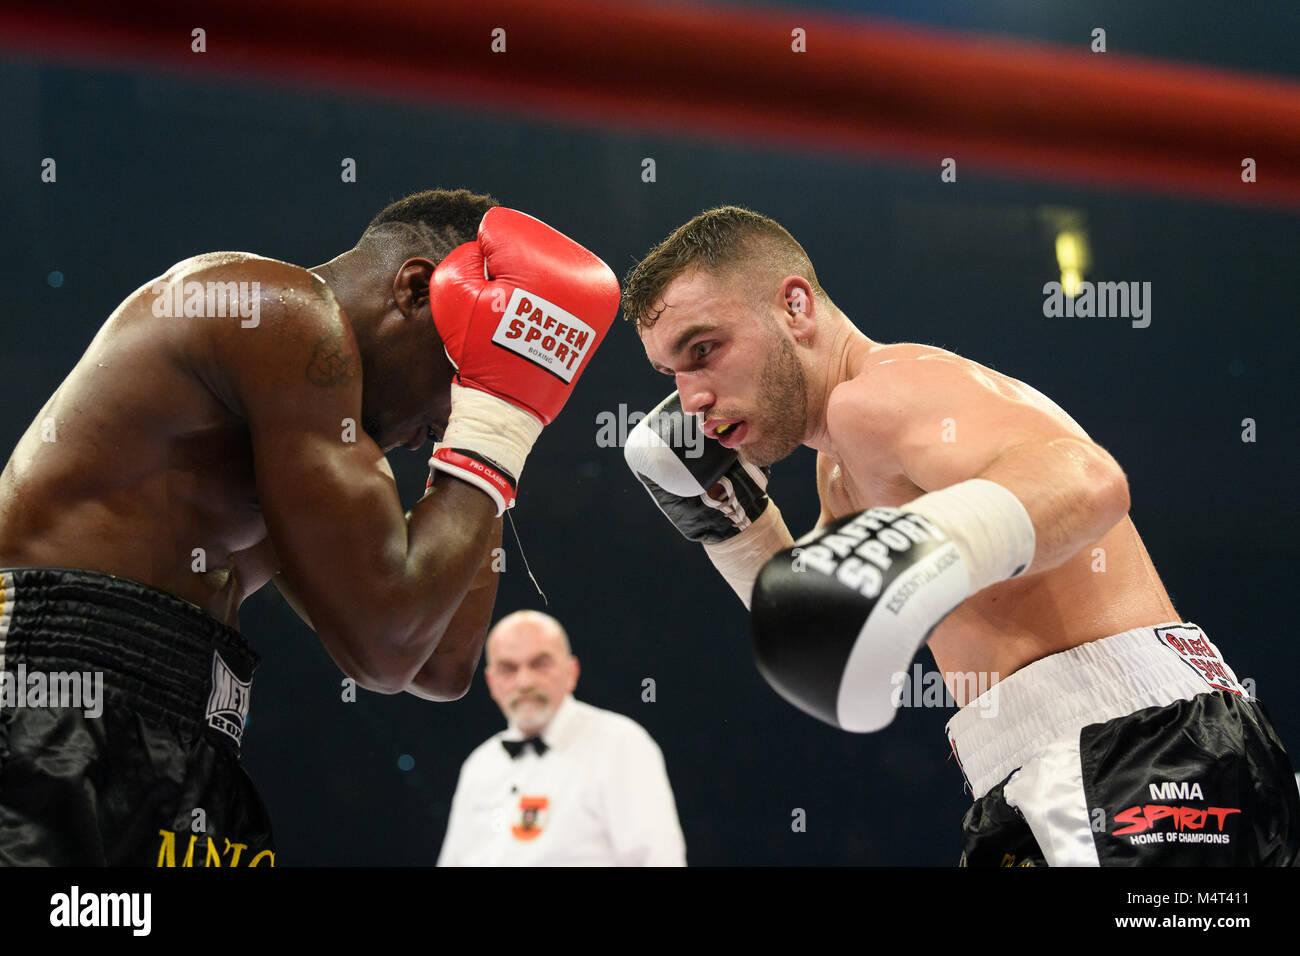 Ludwigsburg, Deutschland. 17th Feb, 2018. Leon Bunn (GER) vs. Maurice Possiti (FRA). GES/ Boxen/ Light Heavyweight - Stock Image